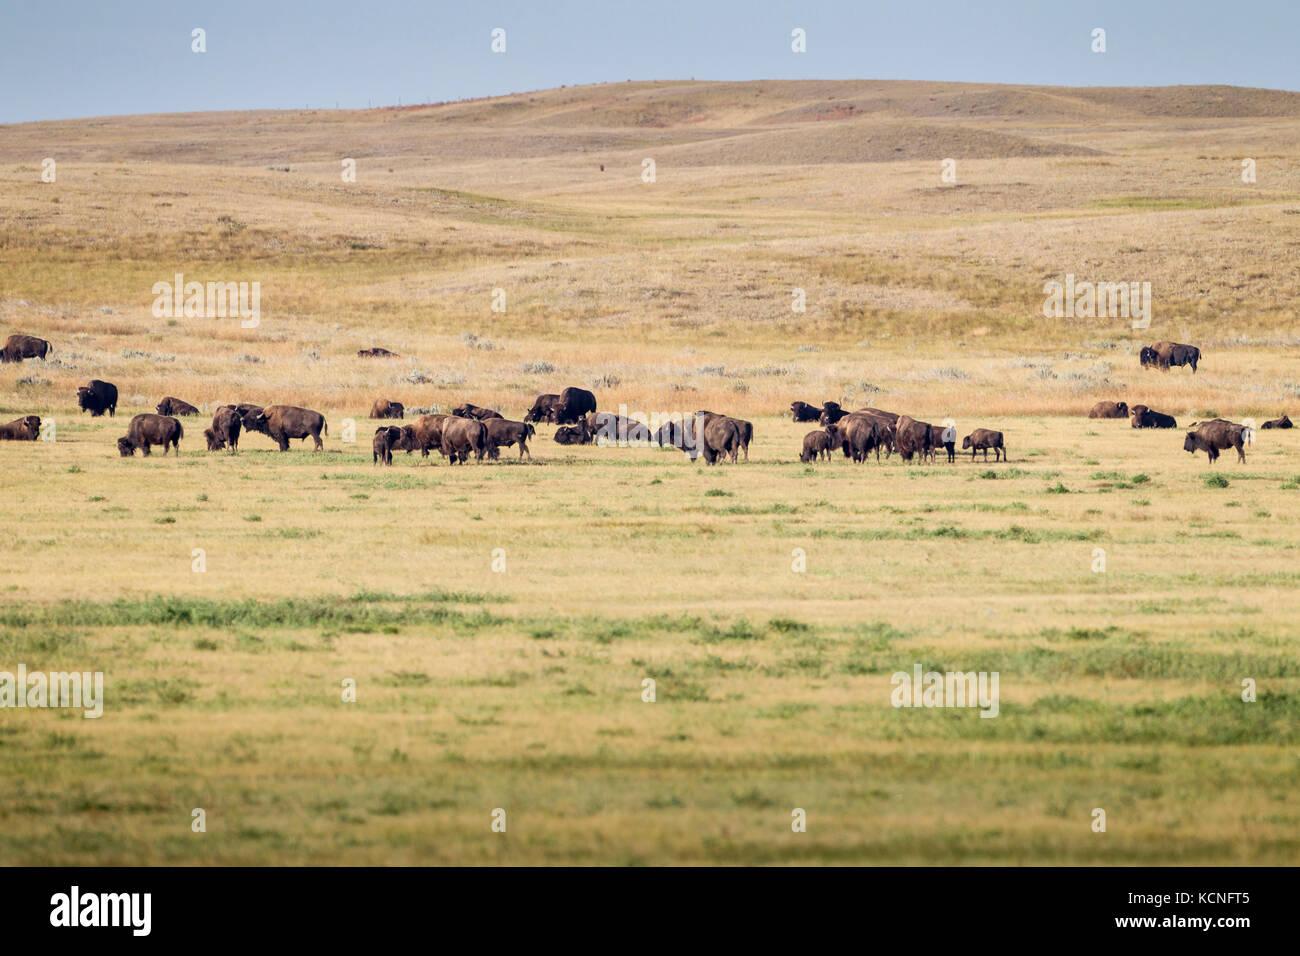 Plains Bison (Bison bison bison) in Grasslands National Park, Saskatchewan, Canada - the Bison roam freely throughout - Stock Image